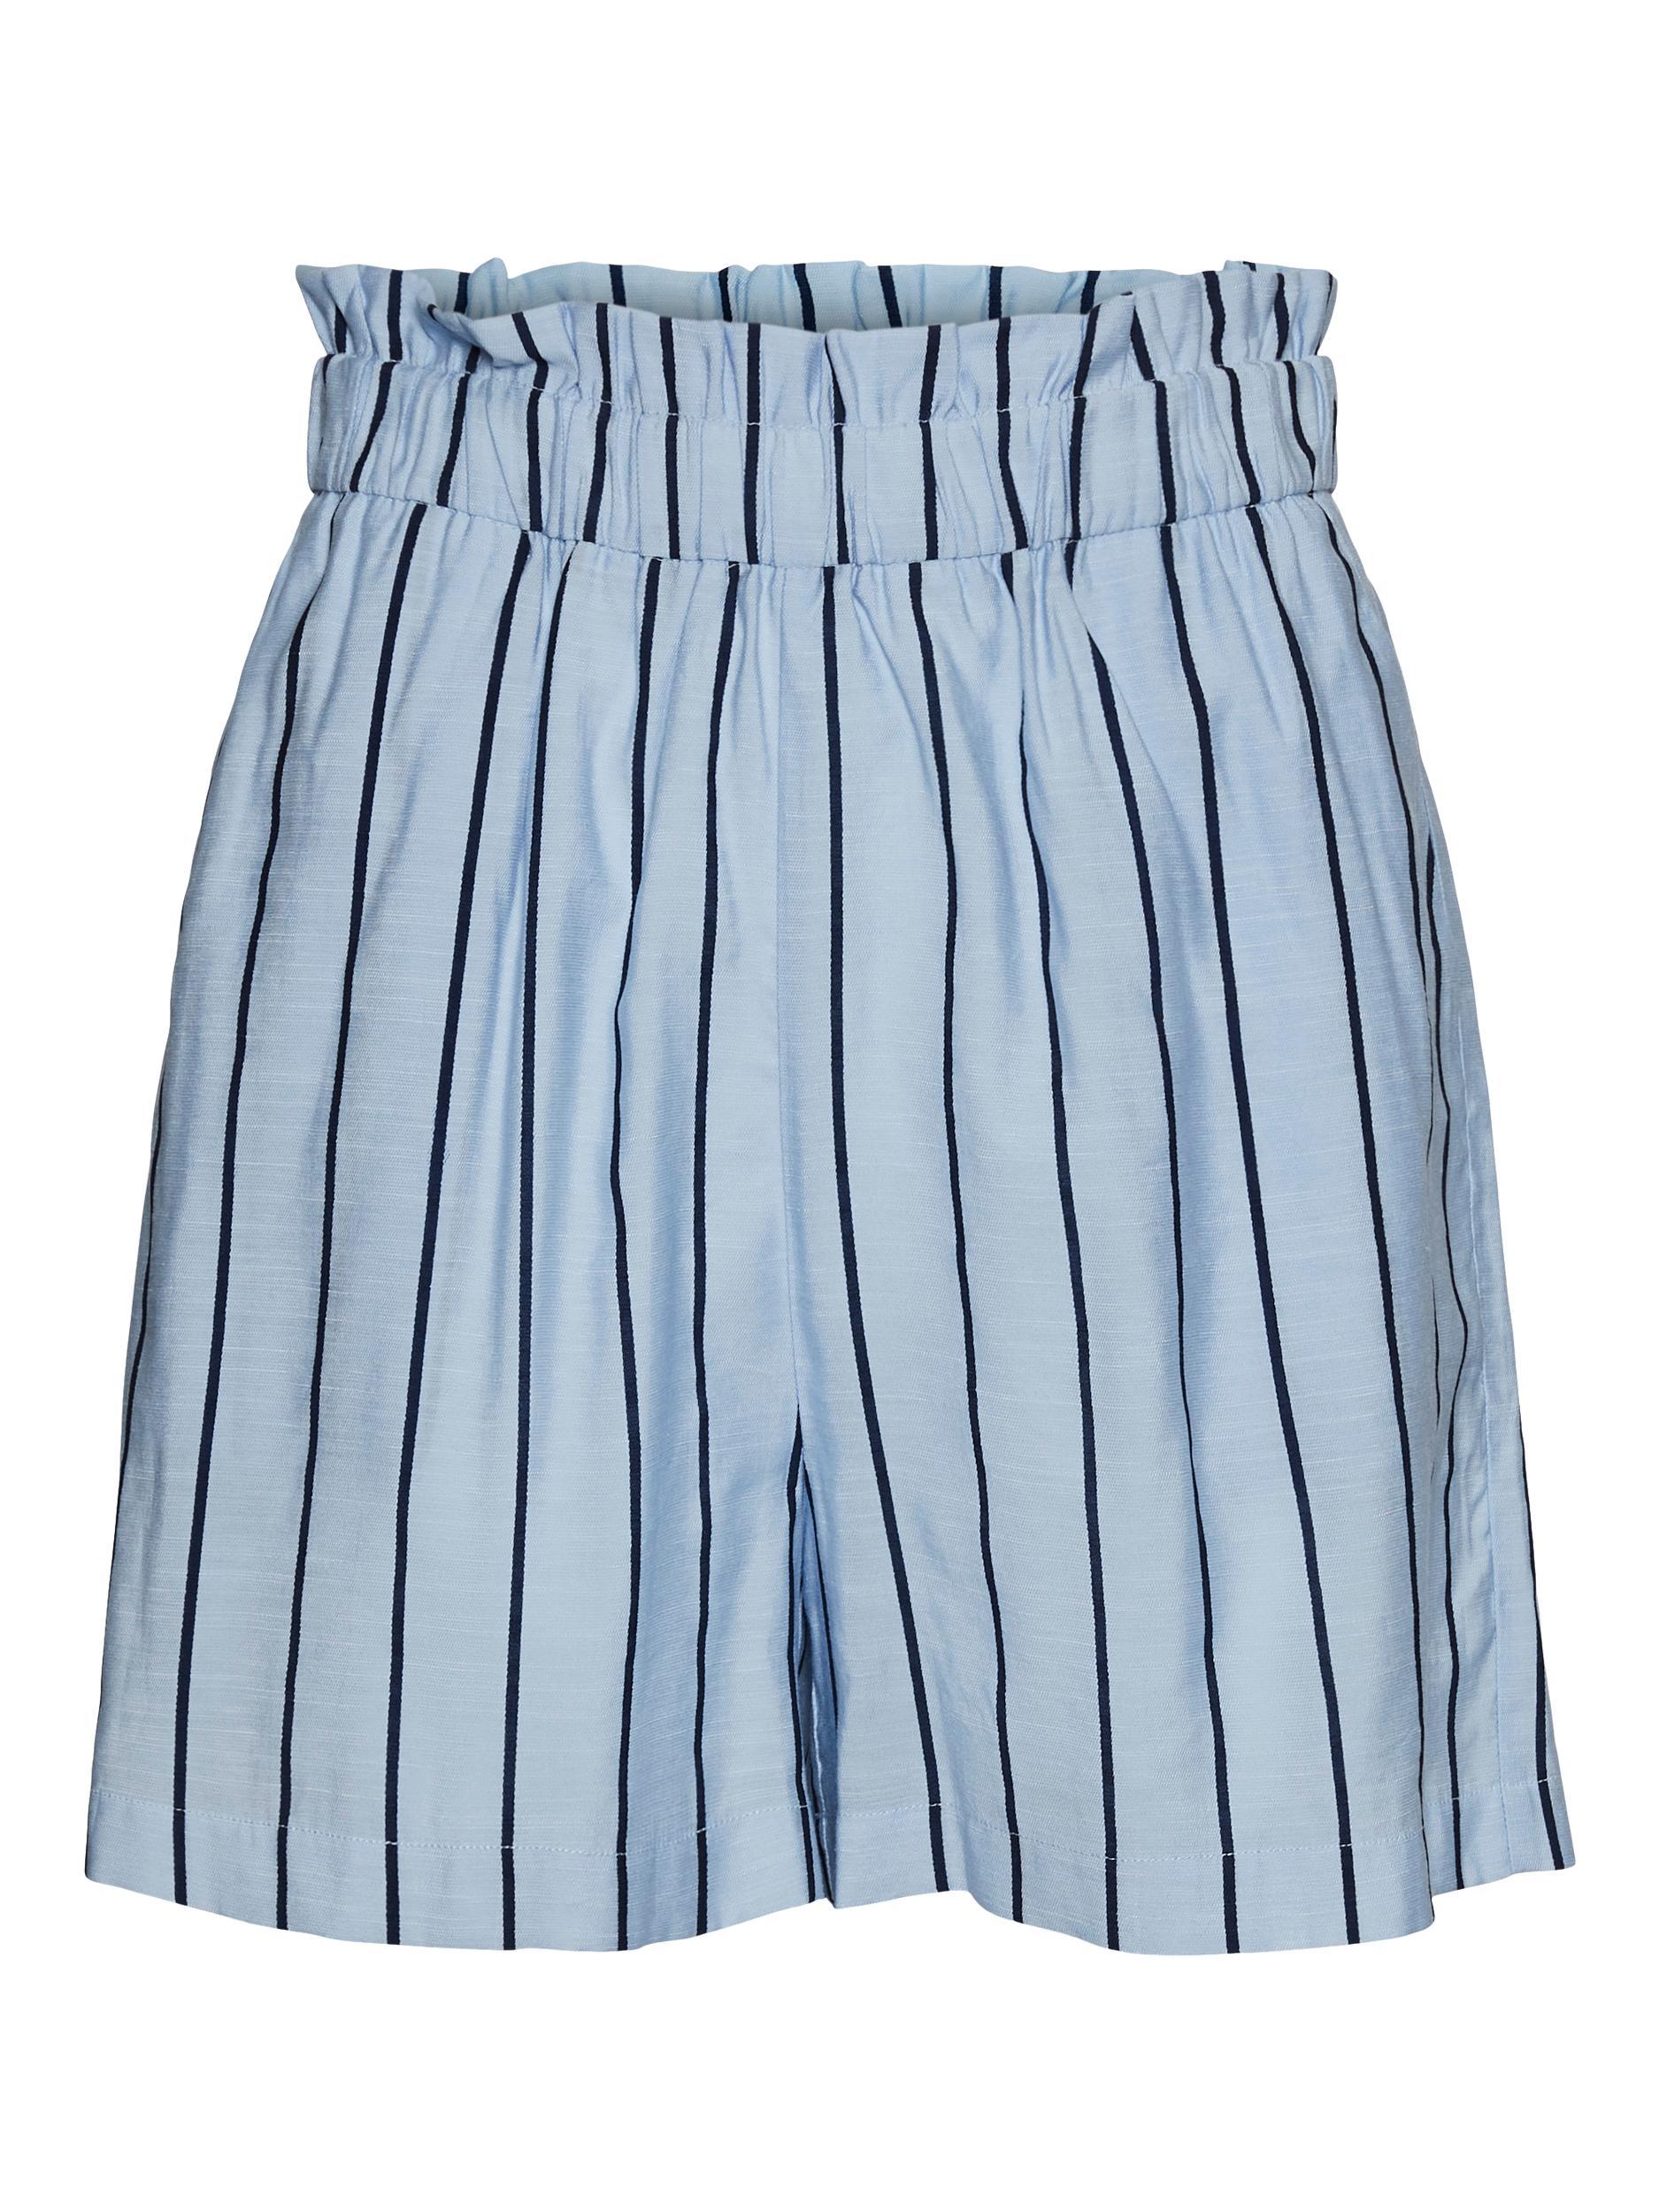 Vero Moda Wilma shorts